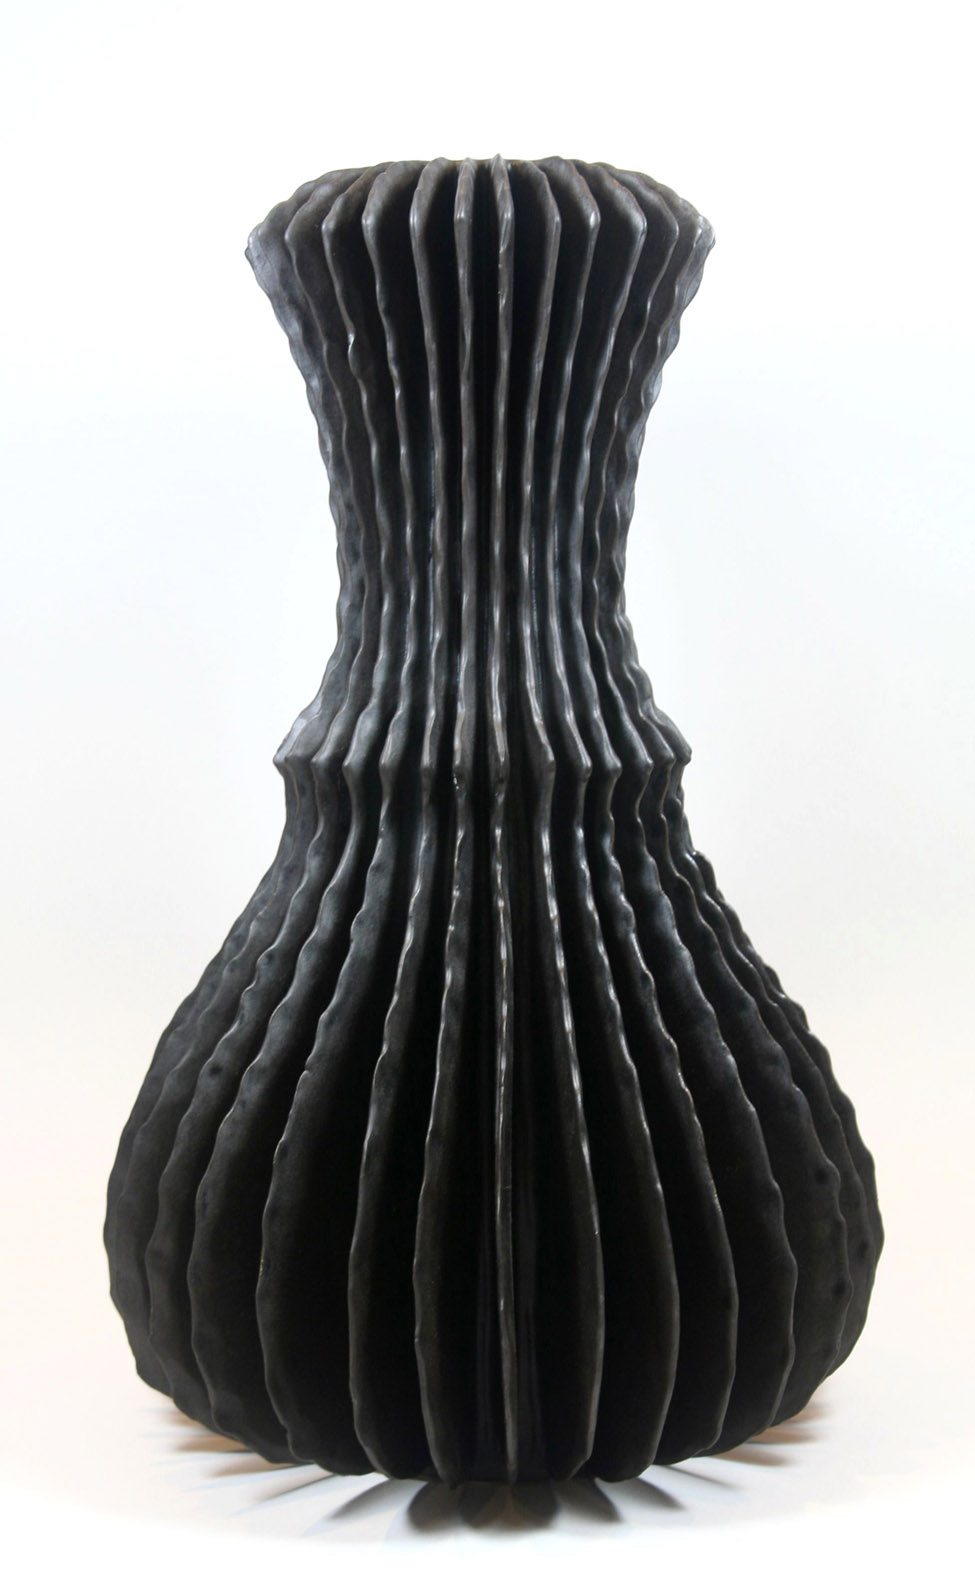 Billowing Vase (3106)